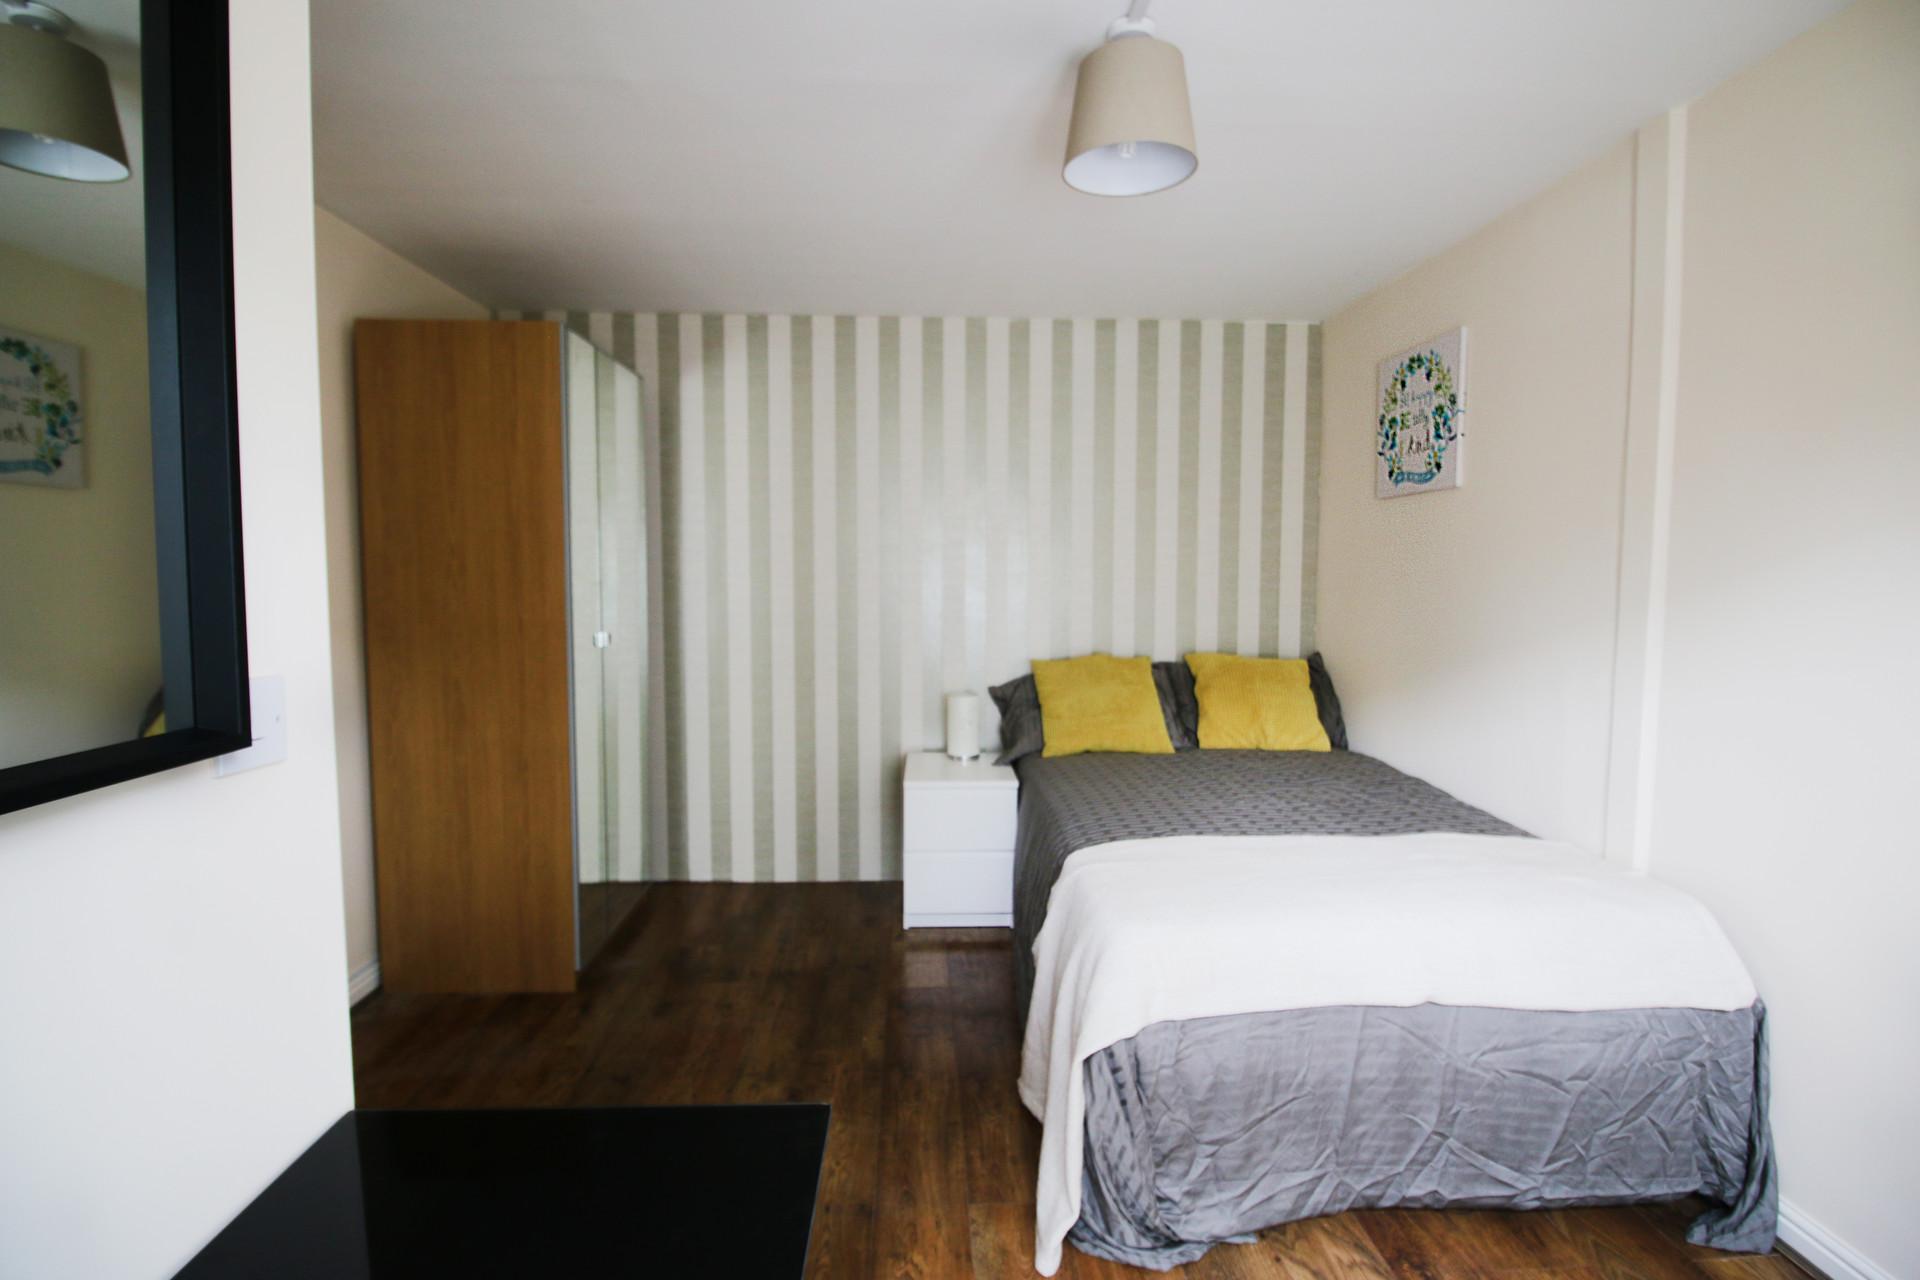 Rooms For Rent Filton Bristol